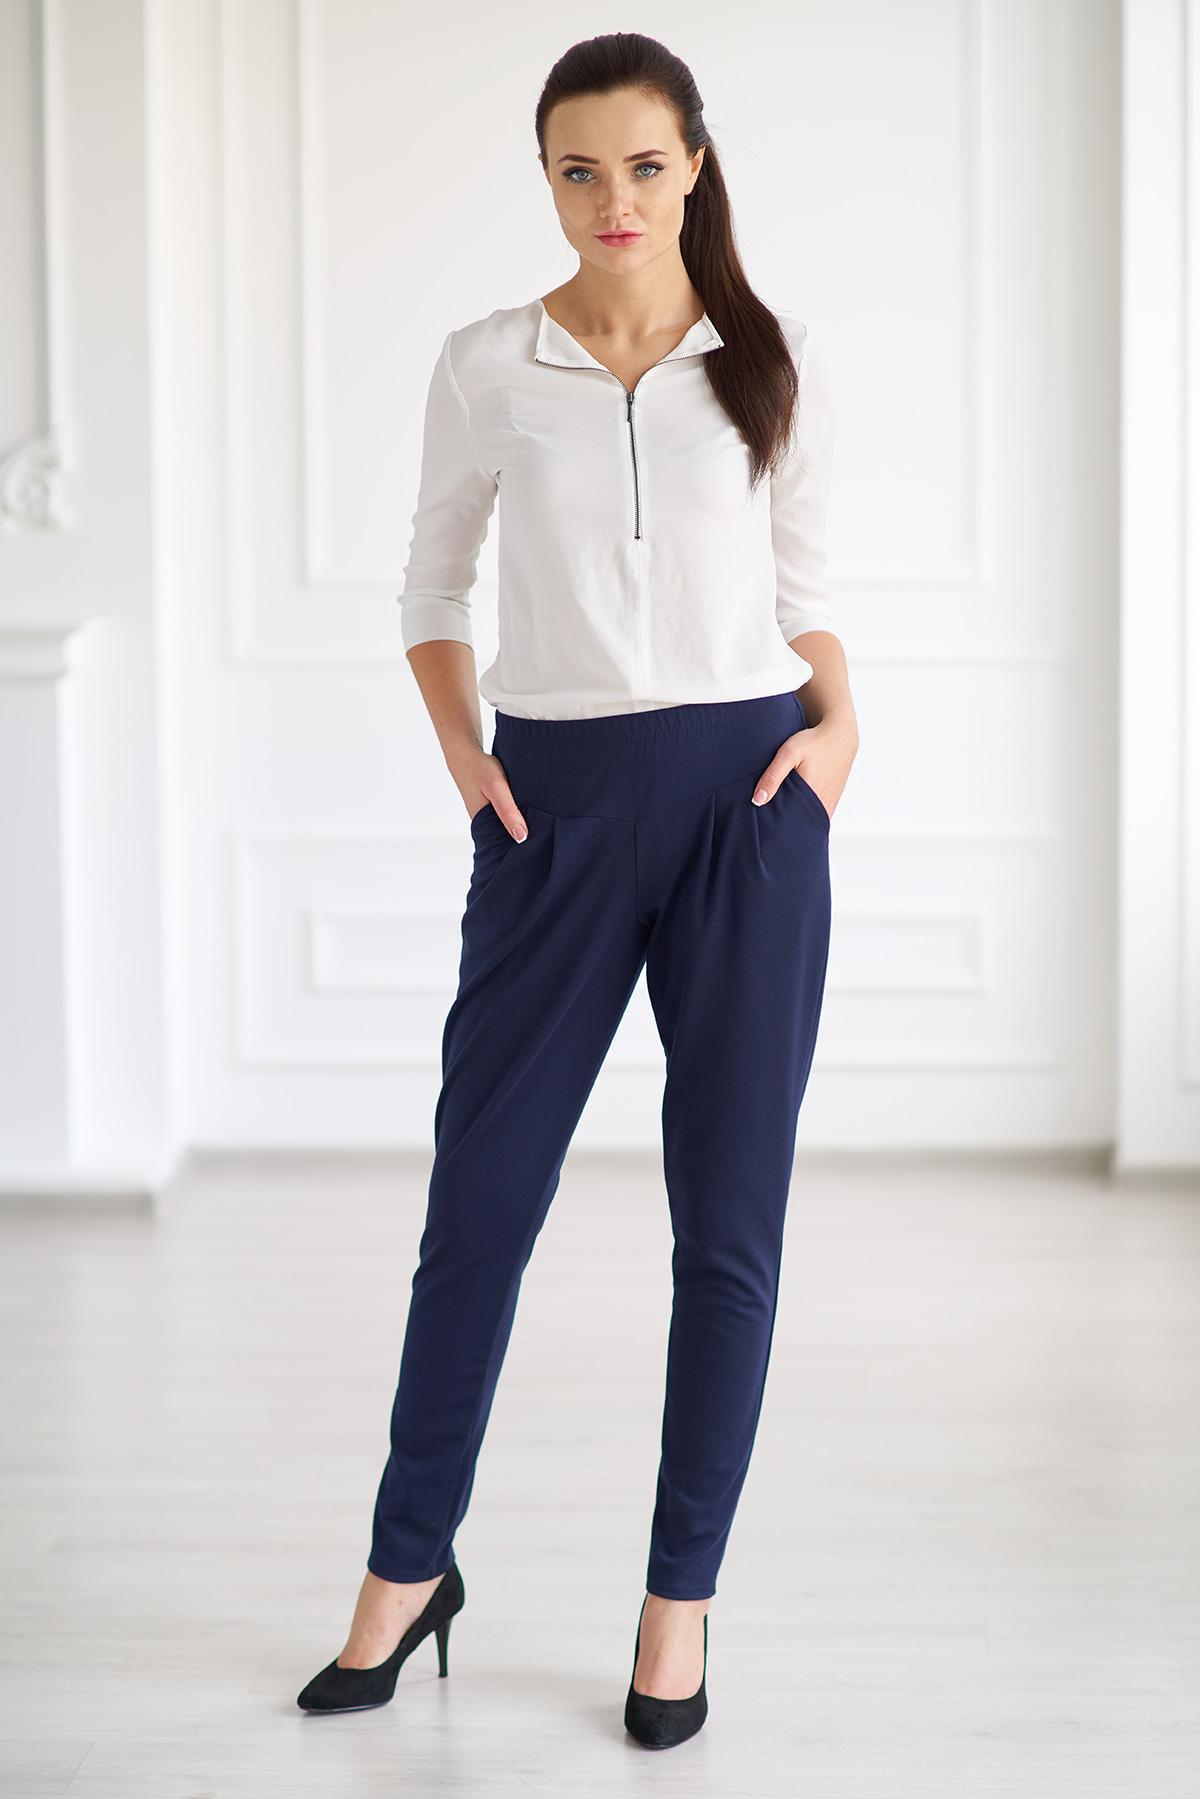 Жен. брюки арт. 19-0004 Темно-синий р. 42Брюки<br>Факт. ОТ: 62 см <br>Факт. ОБ: 86 см <br>Высота посадки брюк: 25 см <br>Длина брючин по внут. шву: 77 см<br><br>Тип: Жен. брюки<br>Размер: 42<br>Материал: Милано